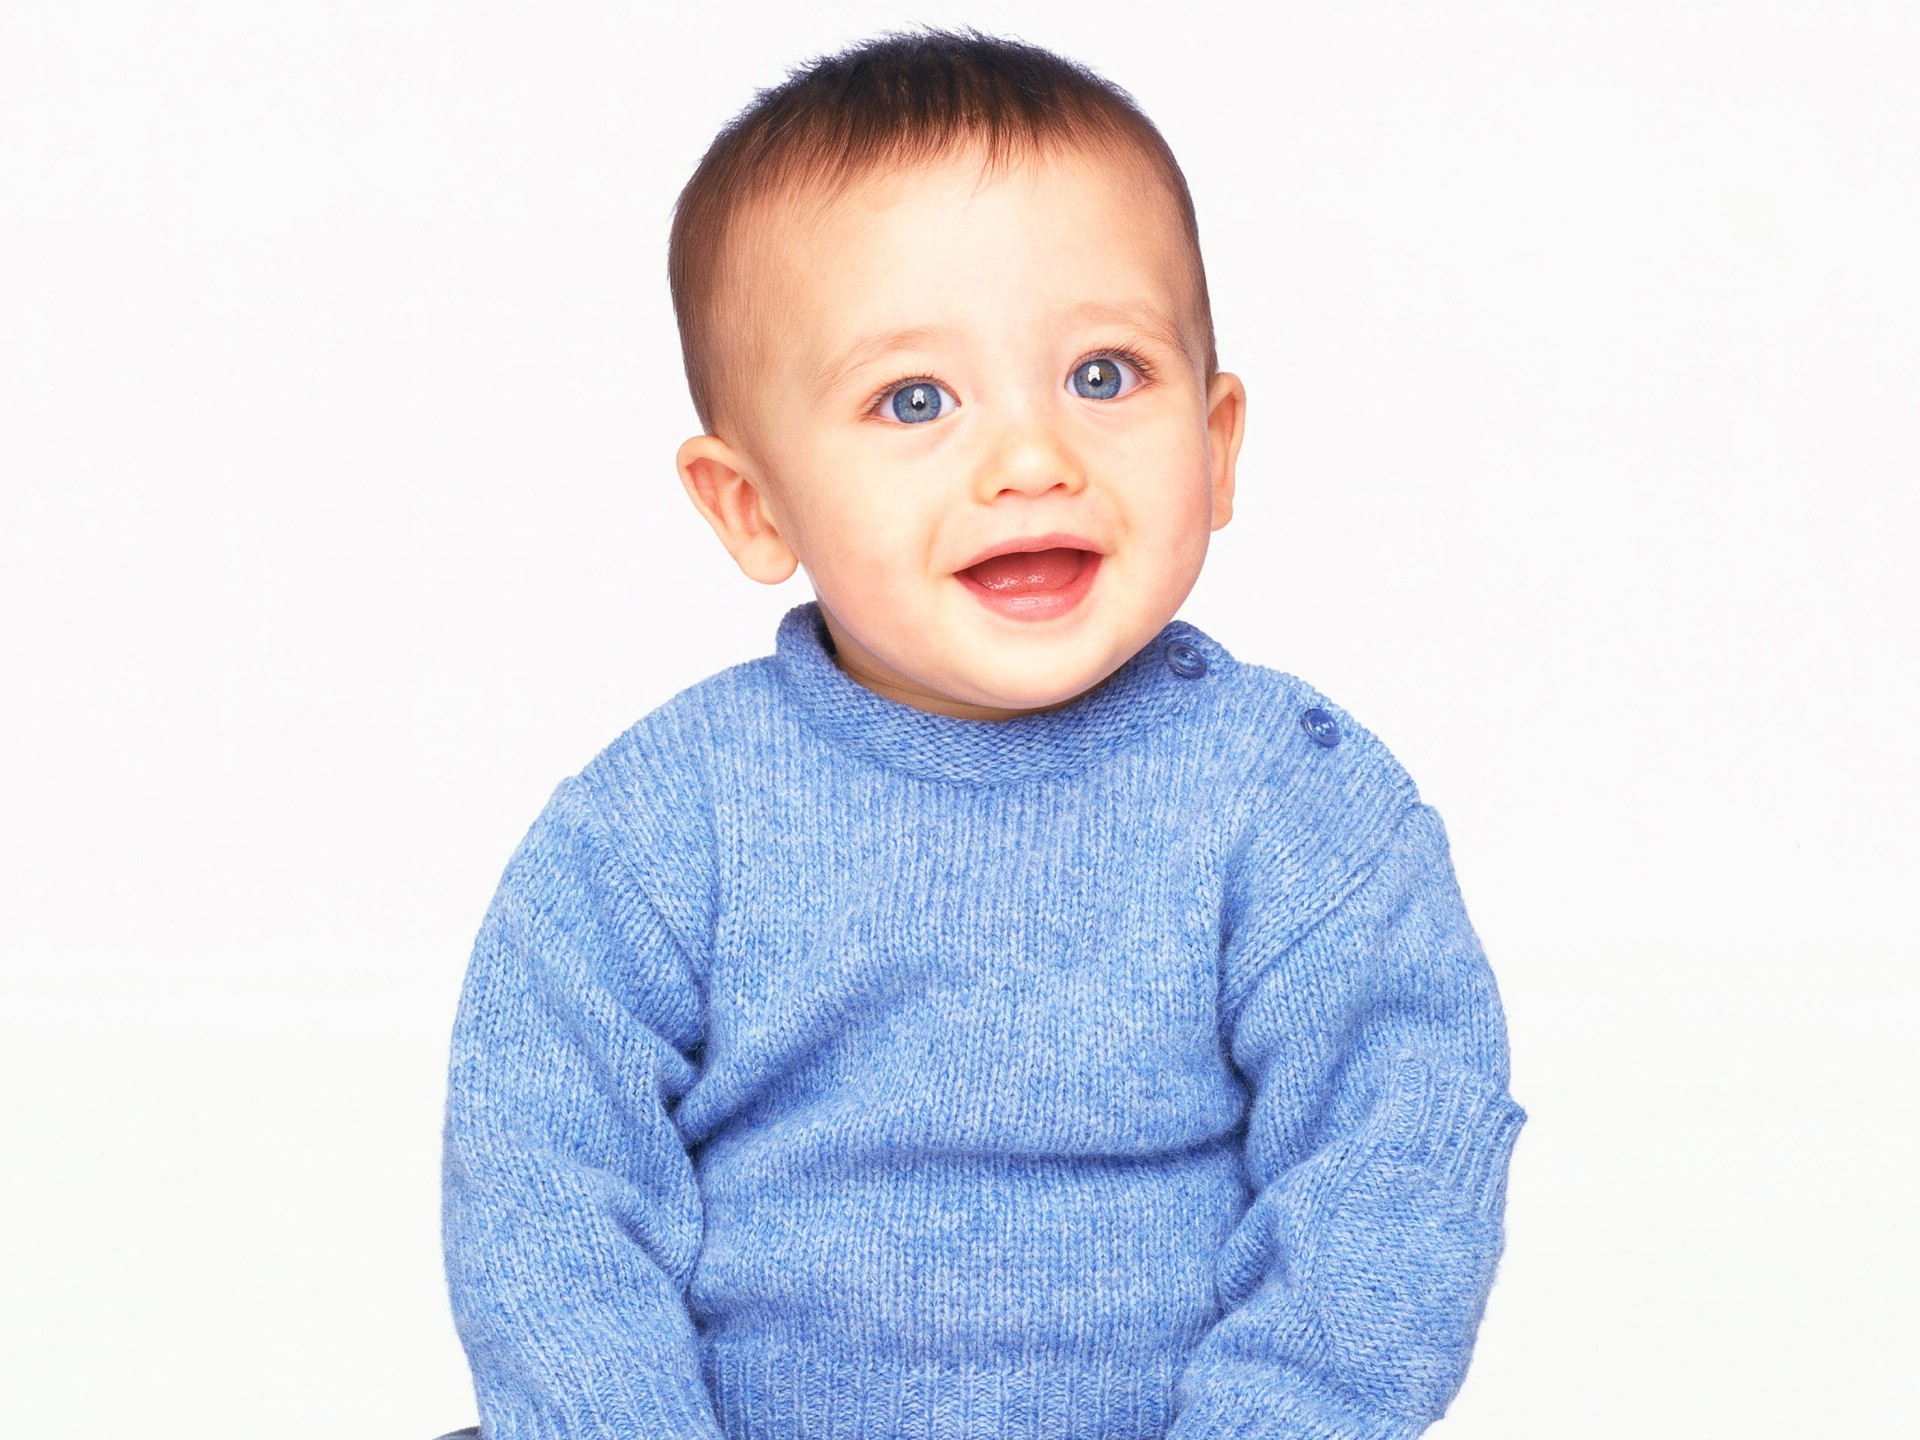 Cute Baby Wear Sweater - Cute Baby Wear Sweater